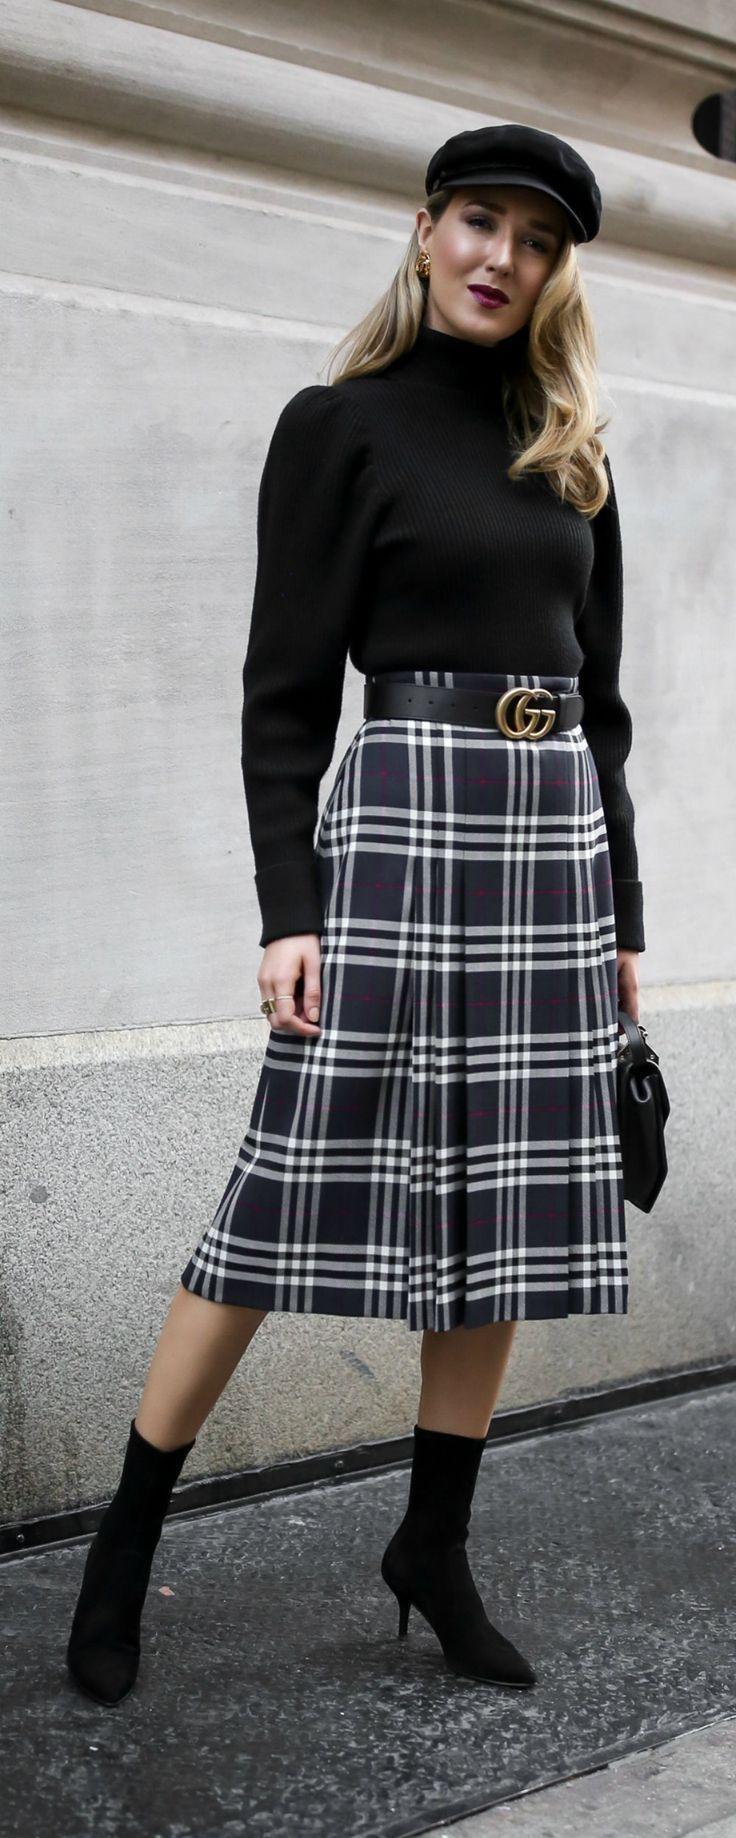 Classic fall style pleated plaid midi skirt black puffed